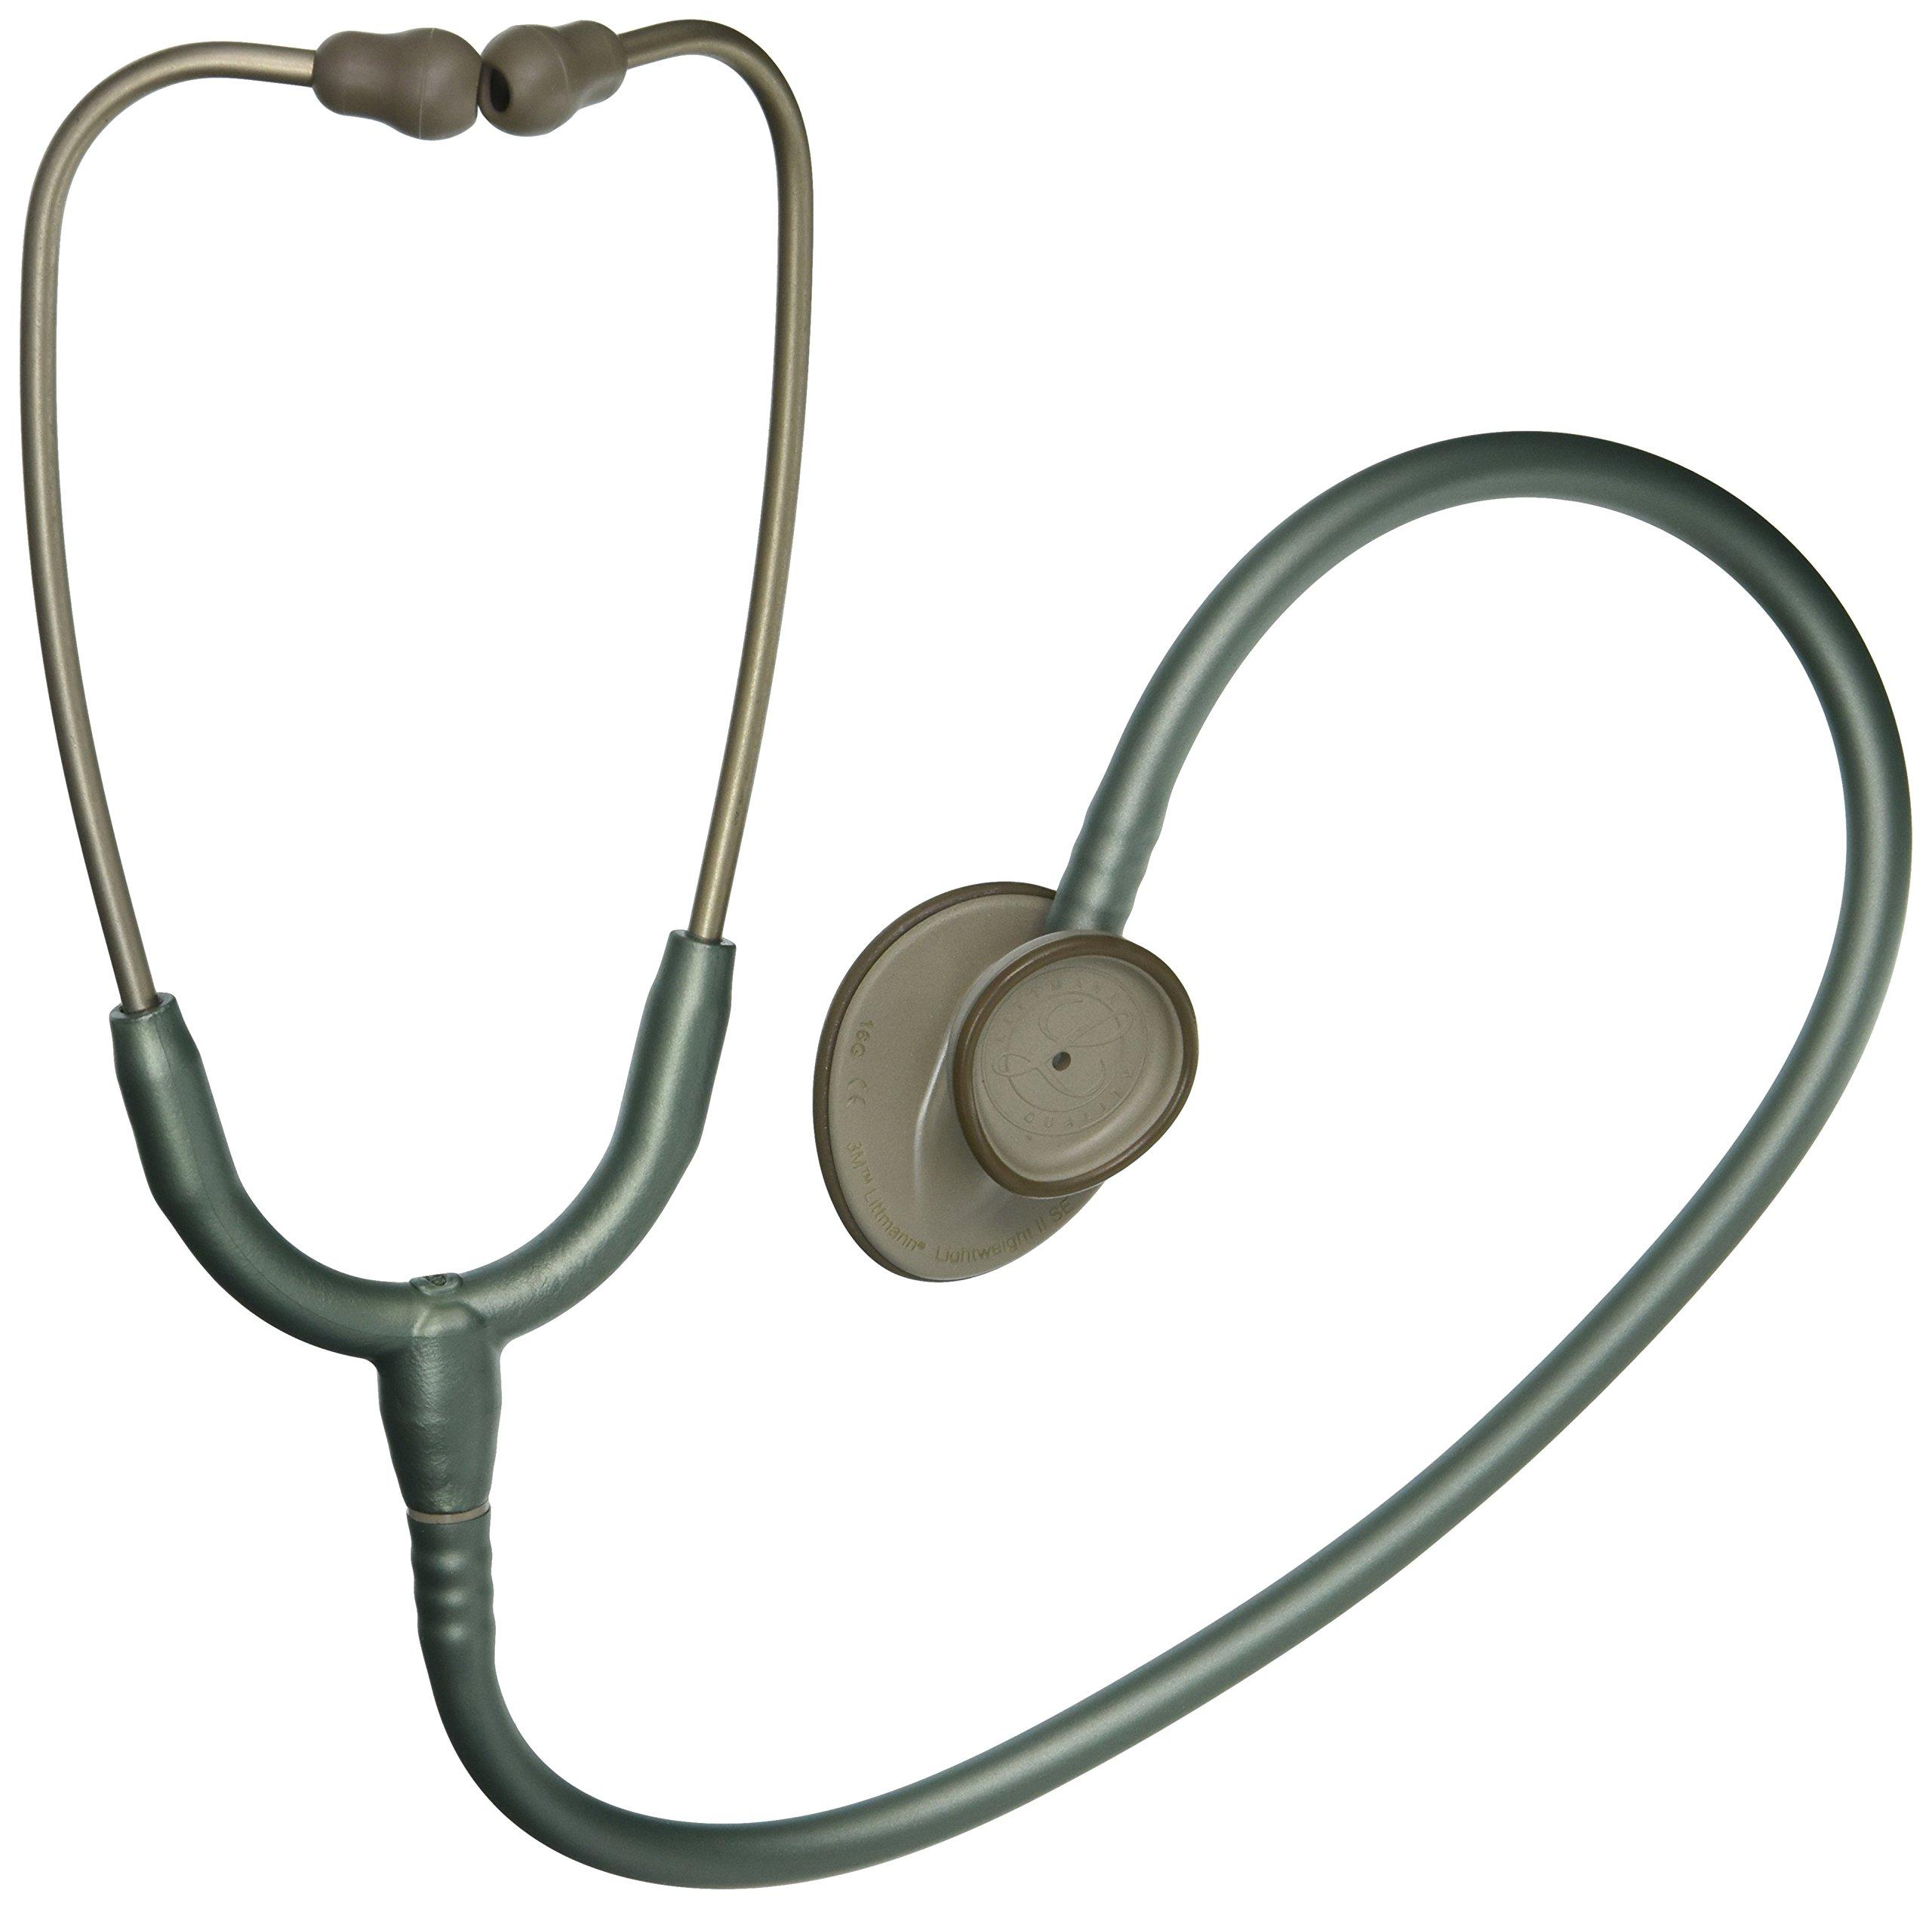 3M Littmann Lightweight II S.E. Stethoscope, Seafoam Green Tube, 28 inch, 2455